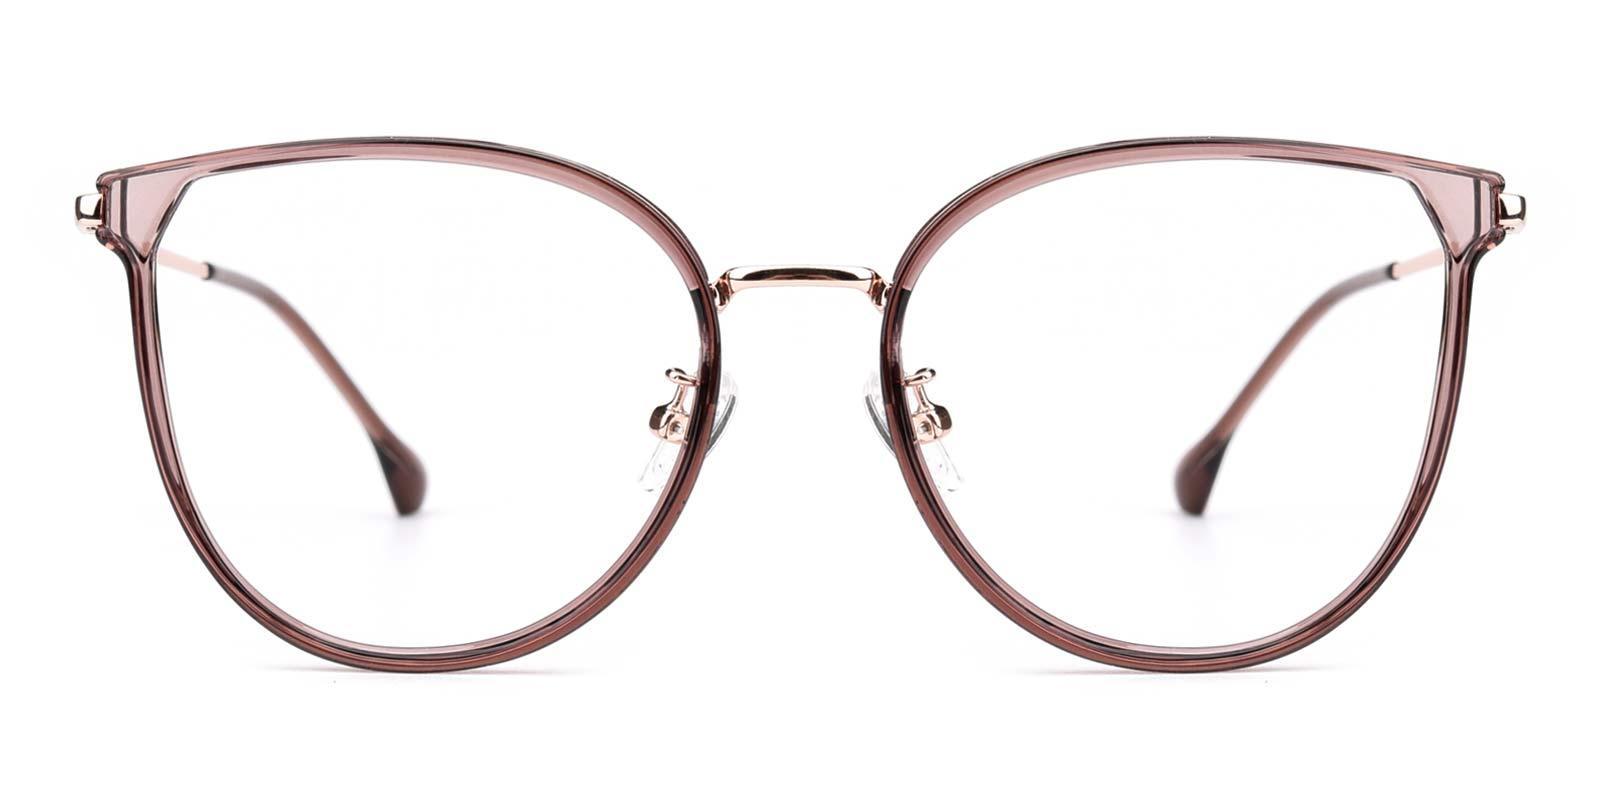 Moonlight-Purple-Round / Cat-TR-Eyeglasses-detail